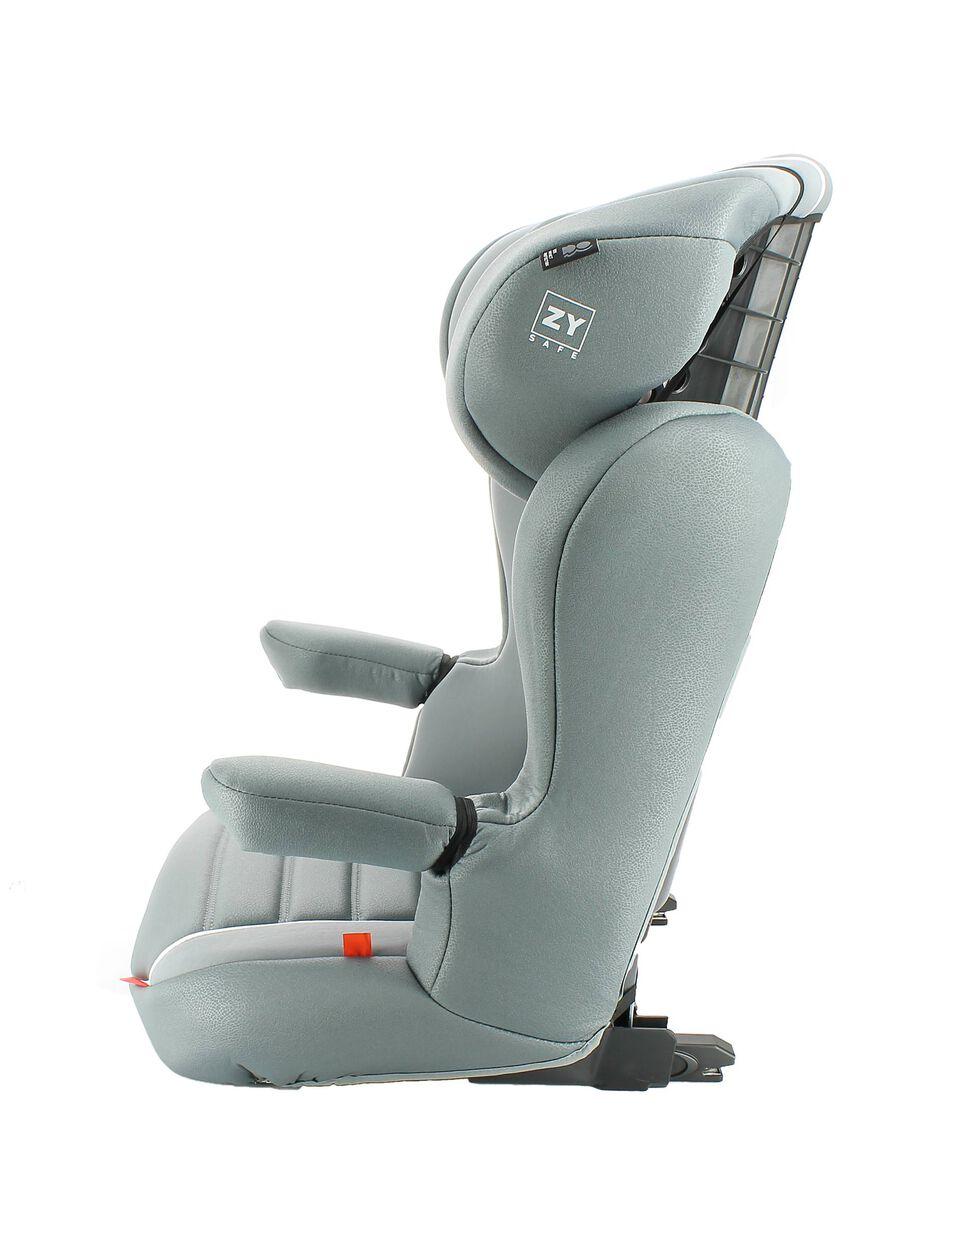 Cadeira Auto Gr 2/3 Isofix Primecare Prestige Zy Safe